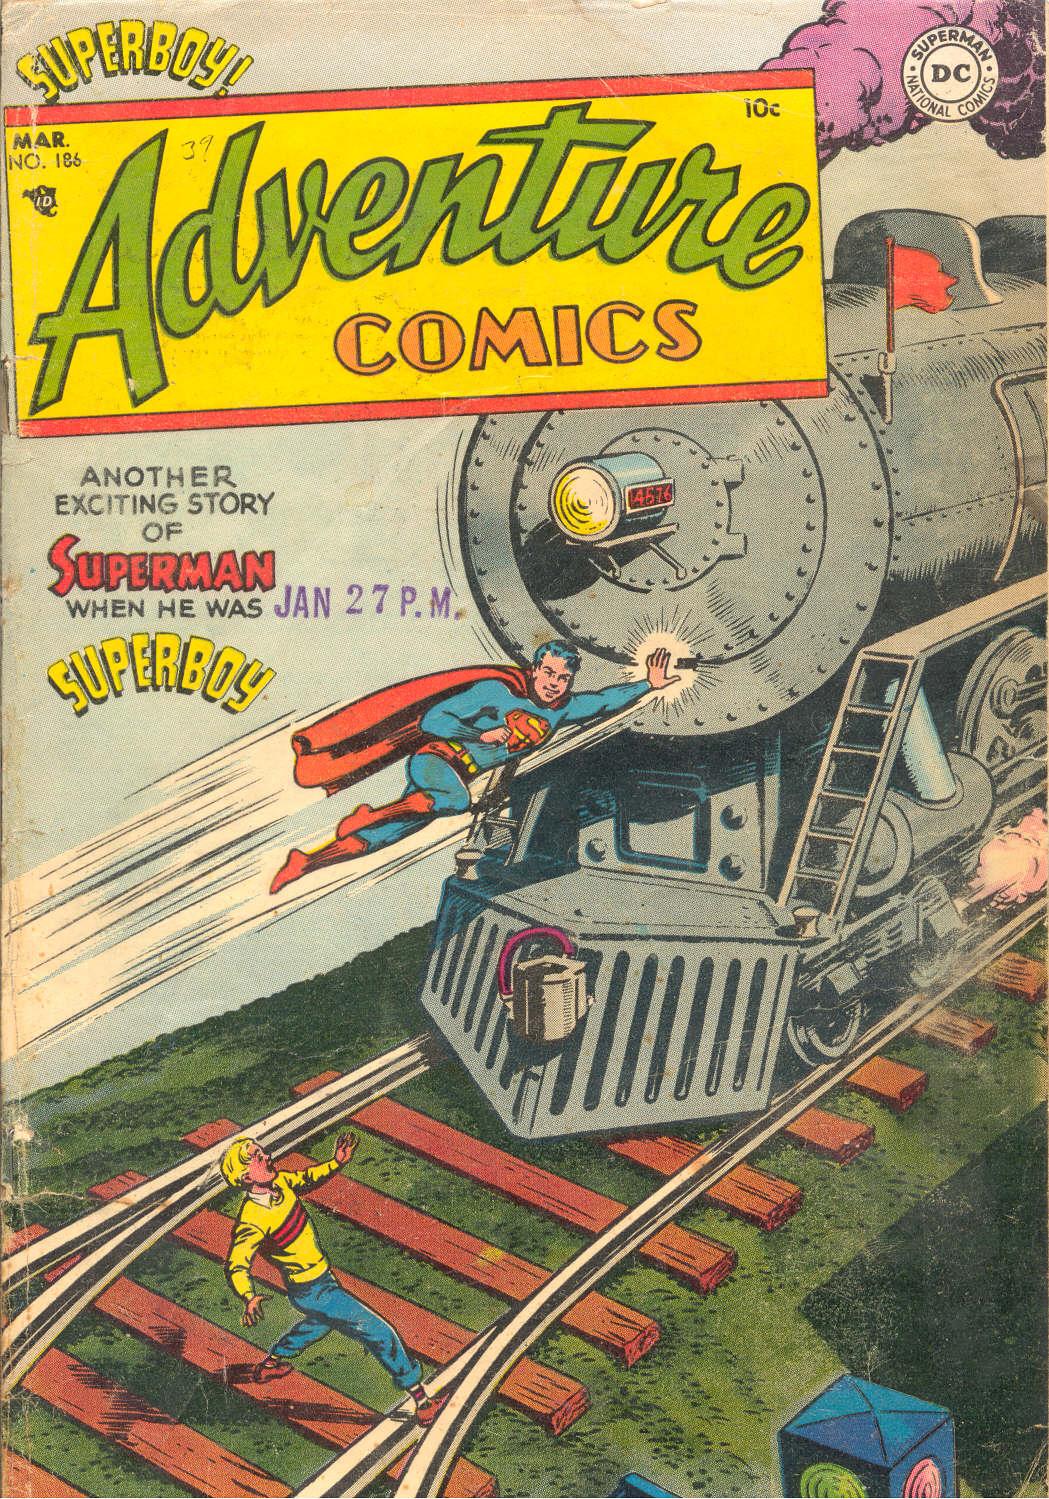 Read online Adventure Comics (1938) comic -  Issue #186 - 1